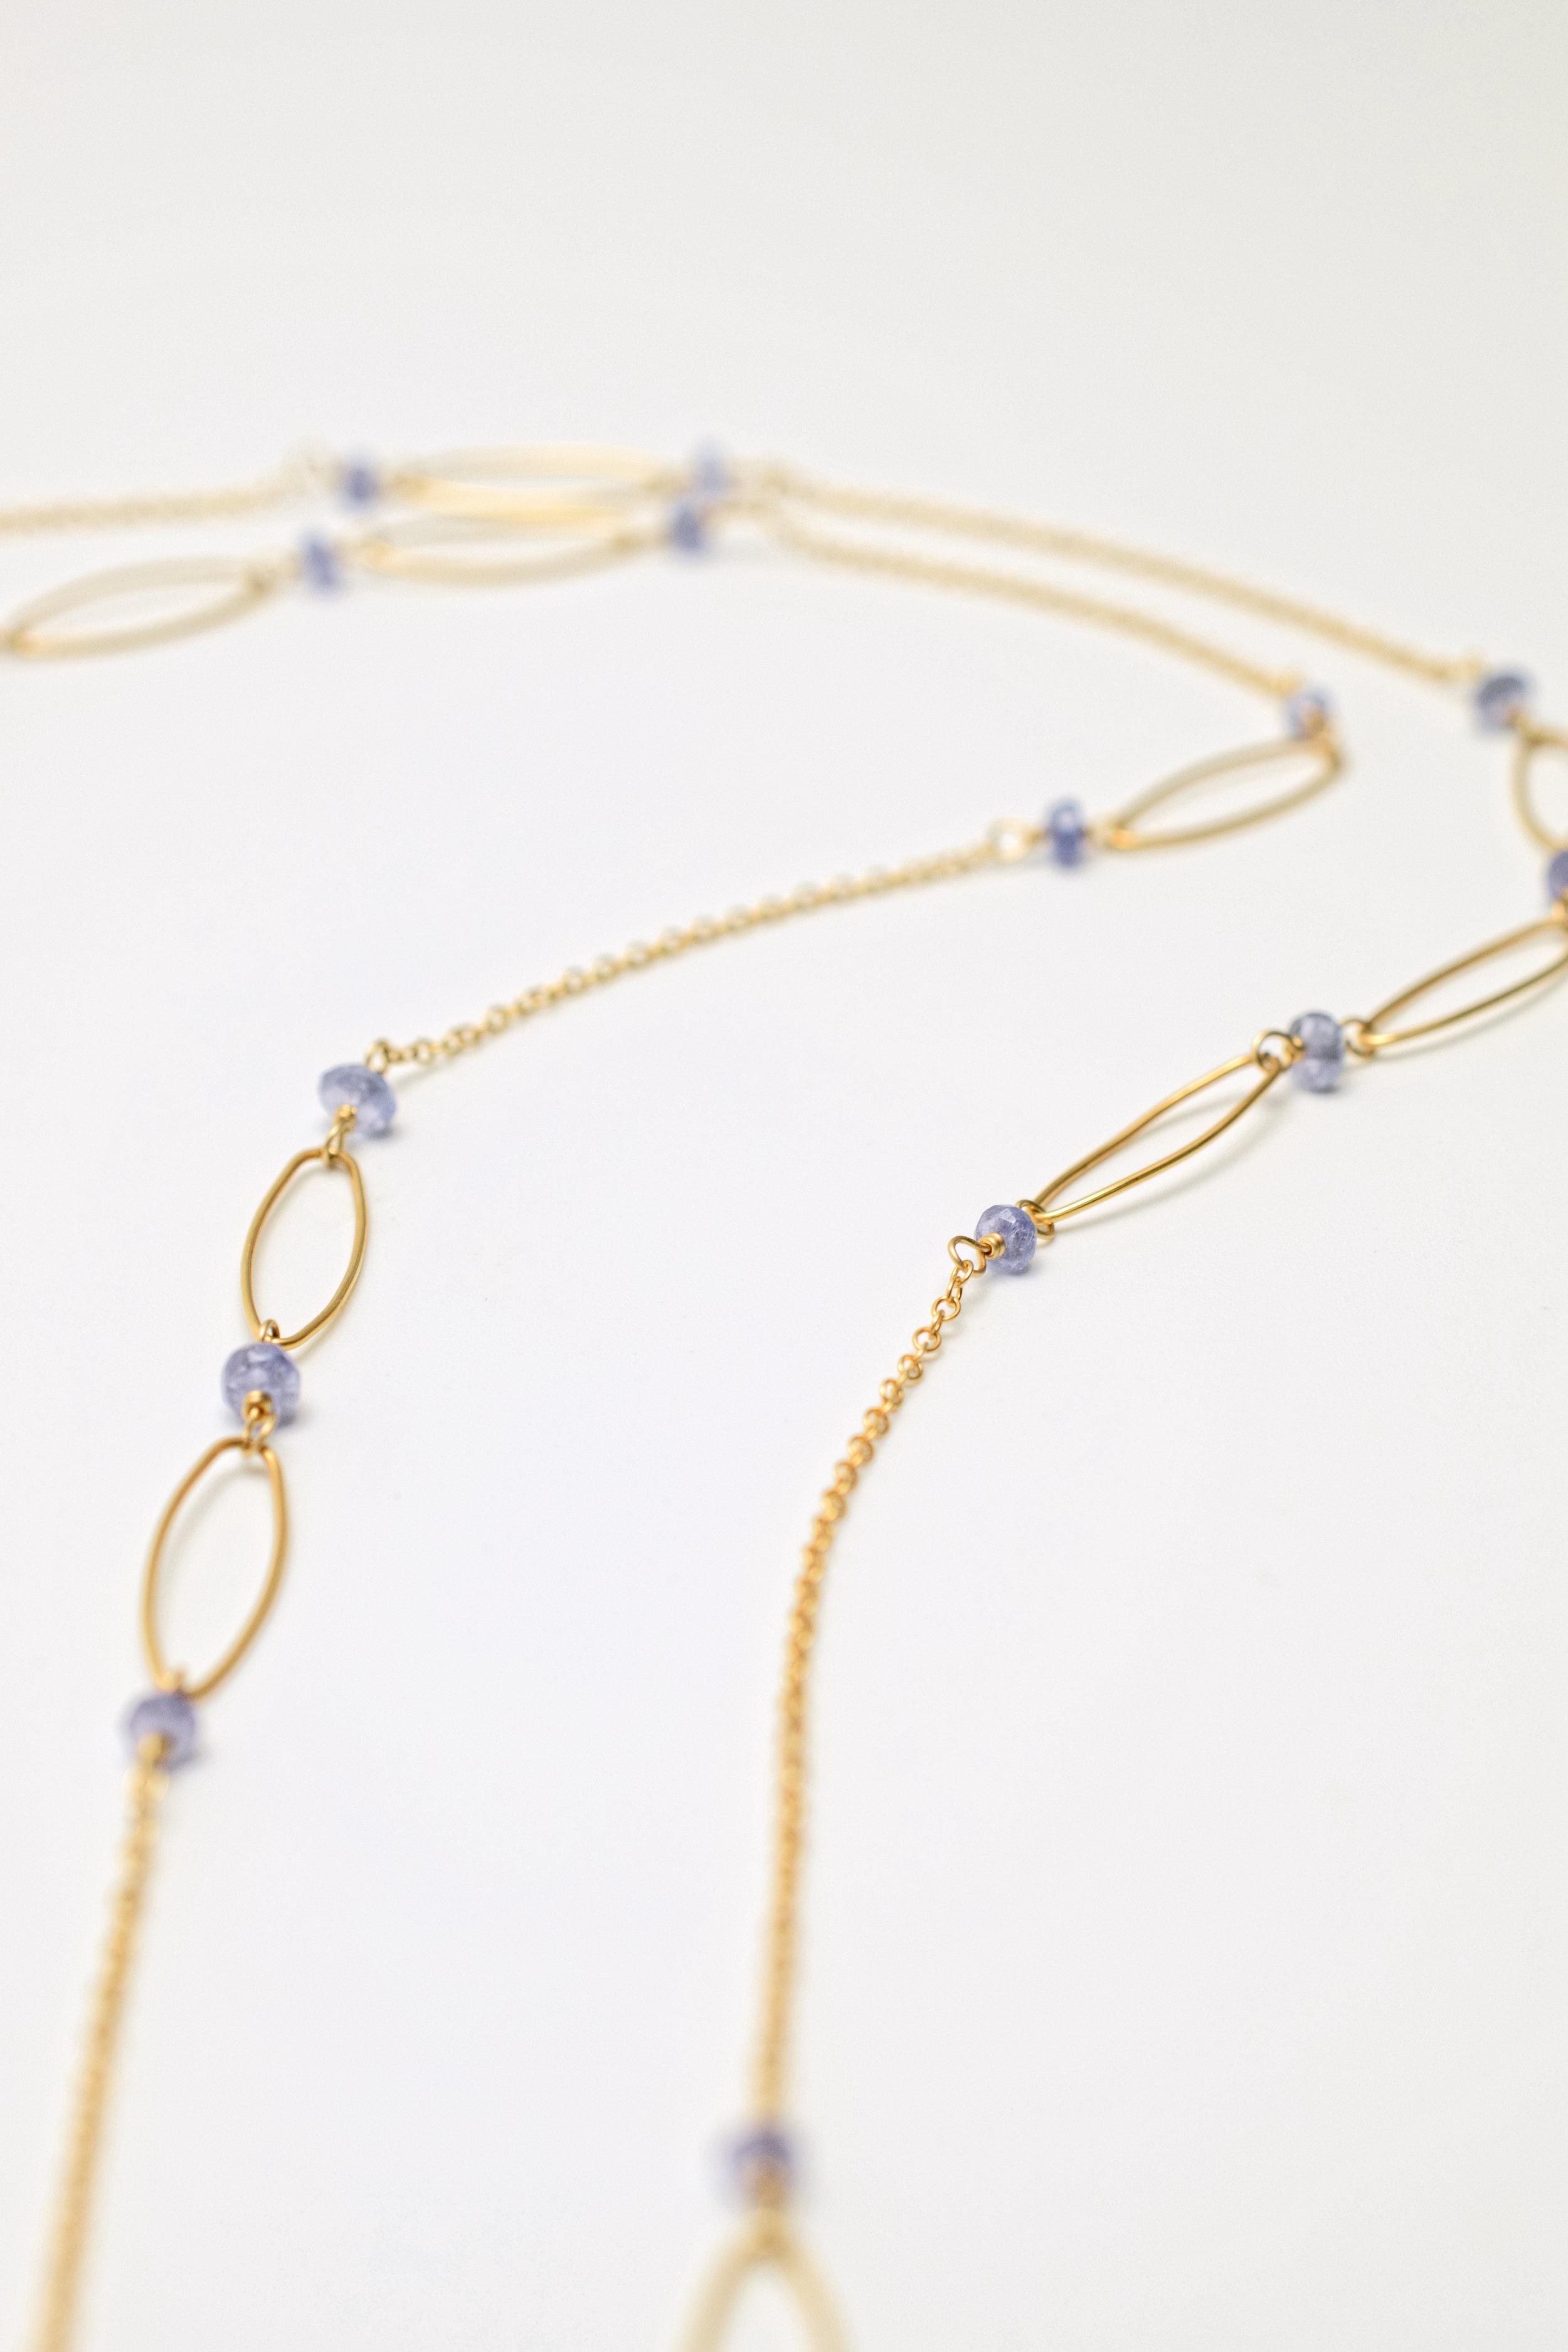 gemstone druzy double gold chain tassel long pendant necklace